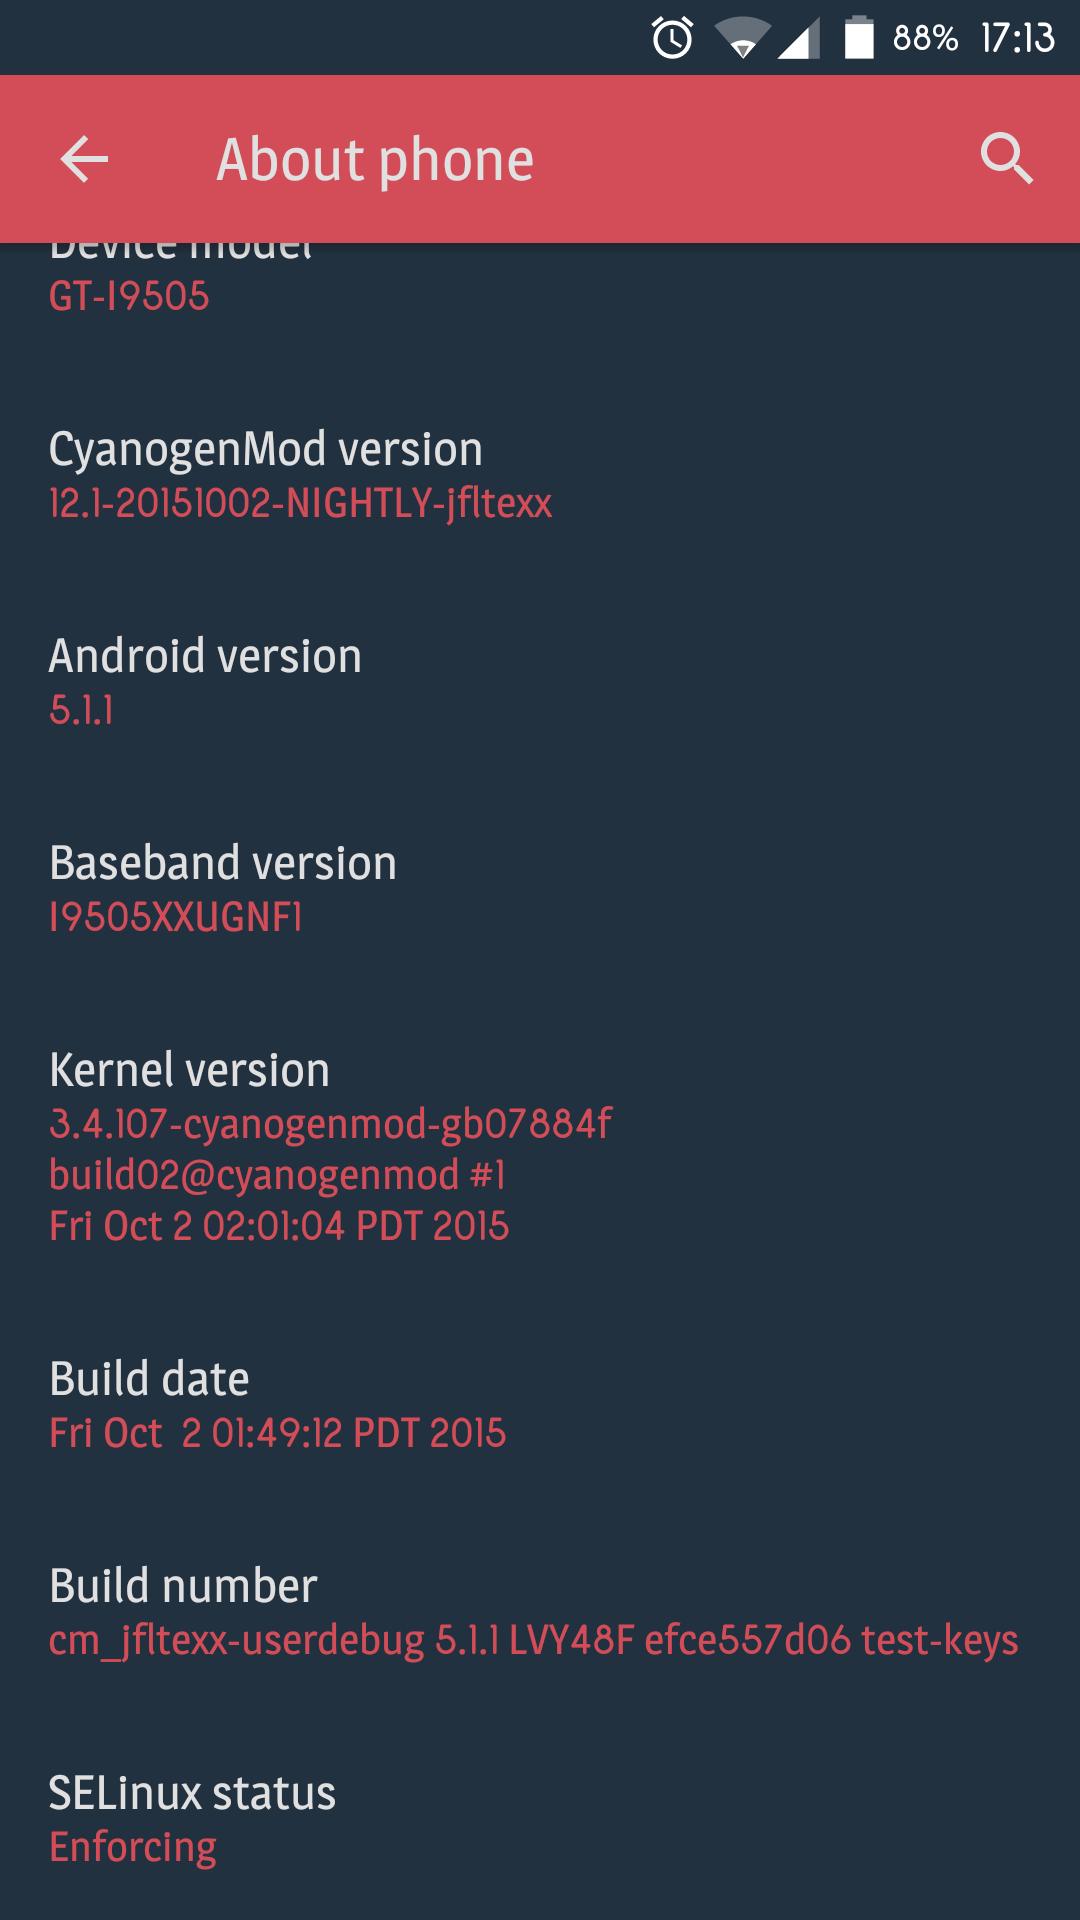 Screenshot_2015-10-04-17-13-19